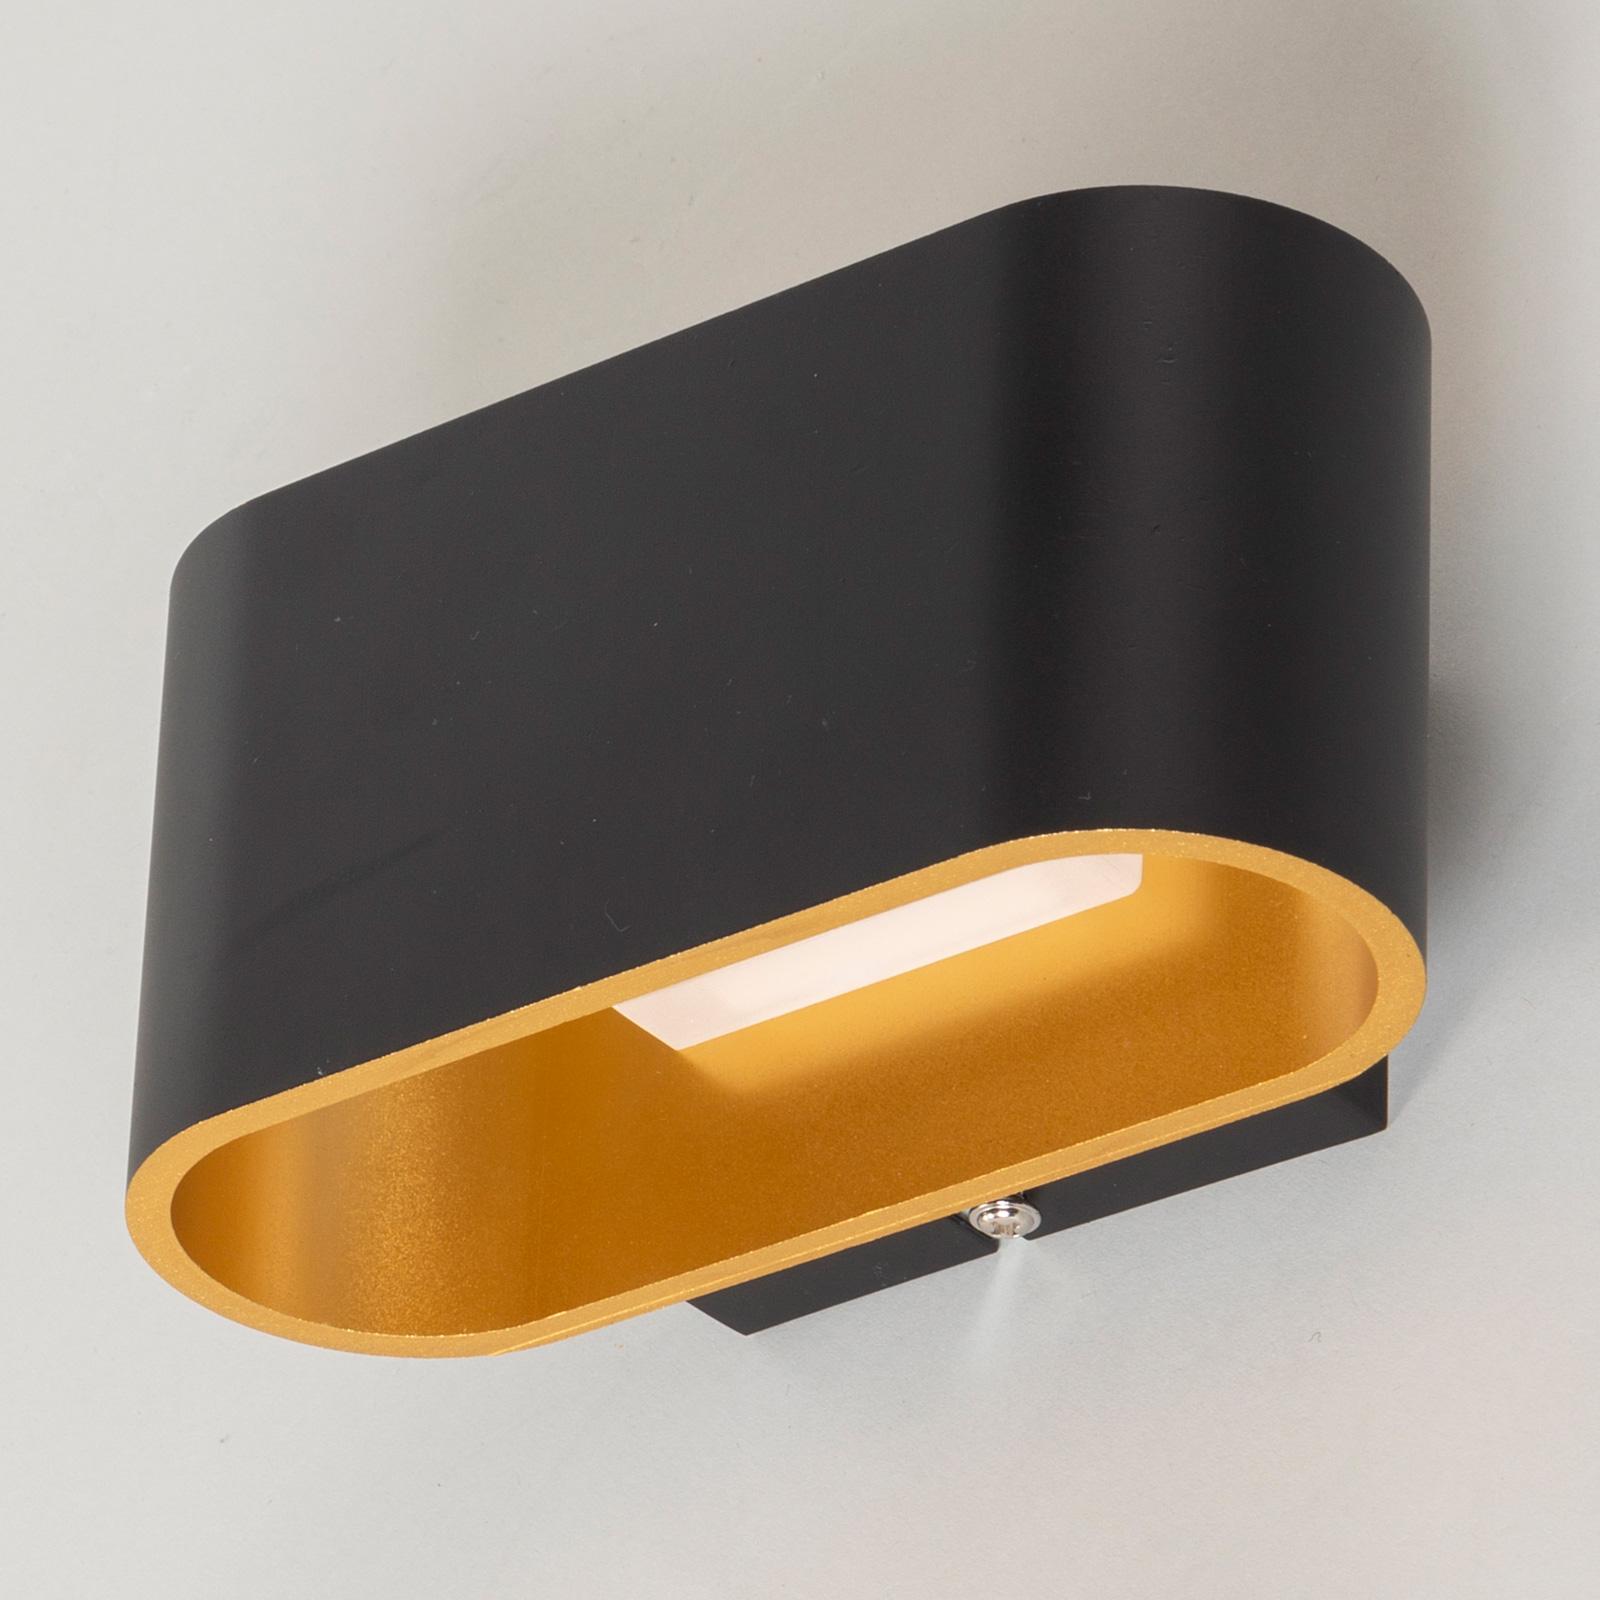 LED-Wandleuchte Denzel in Schwarz/Gold